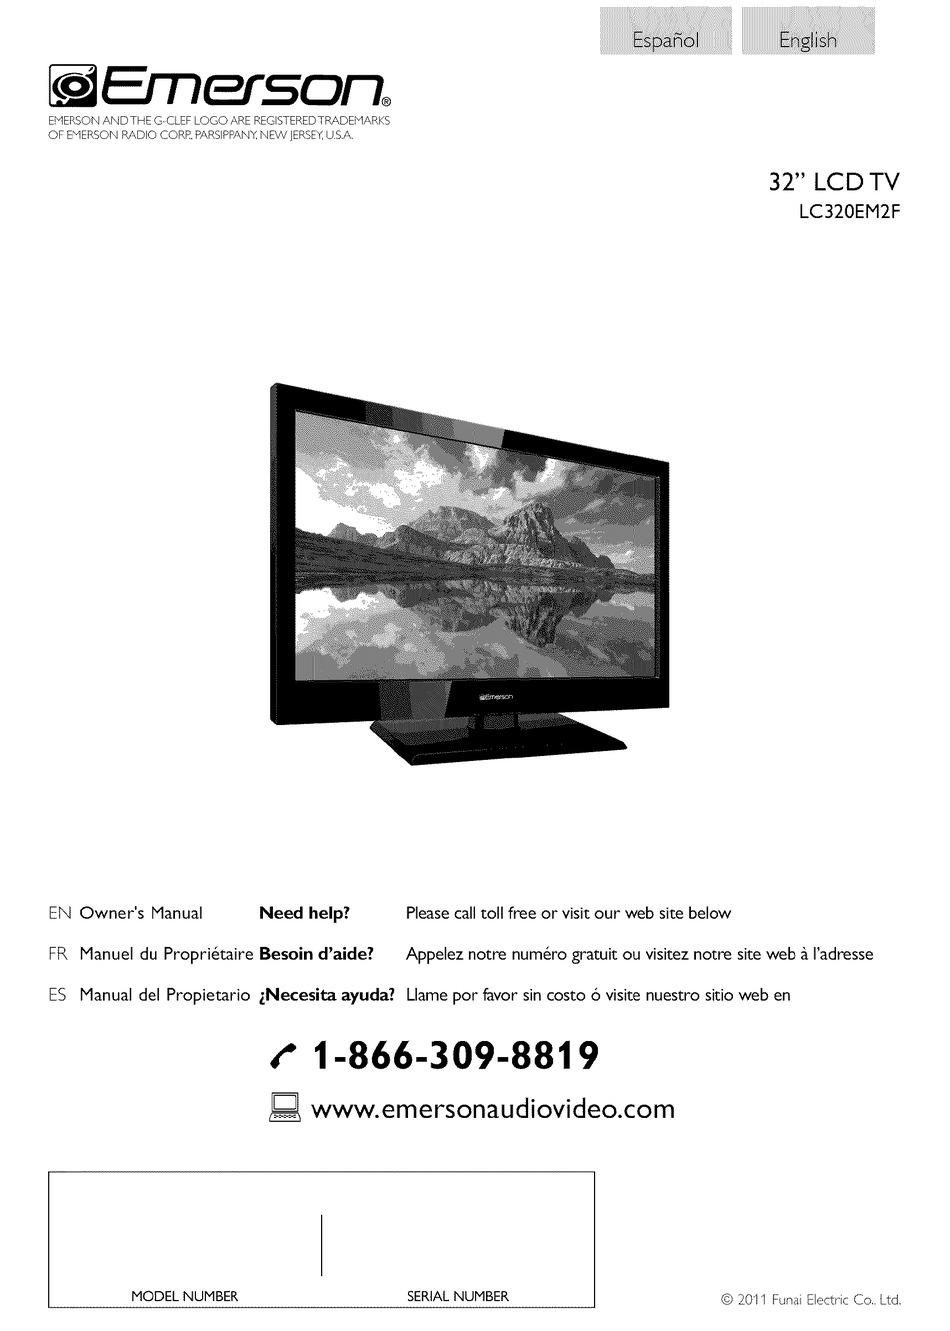 Emerson Lc320em2f Owner S Manual Pdf Download Manualslib